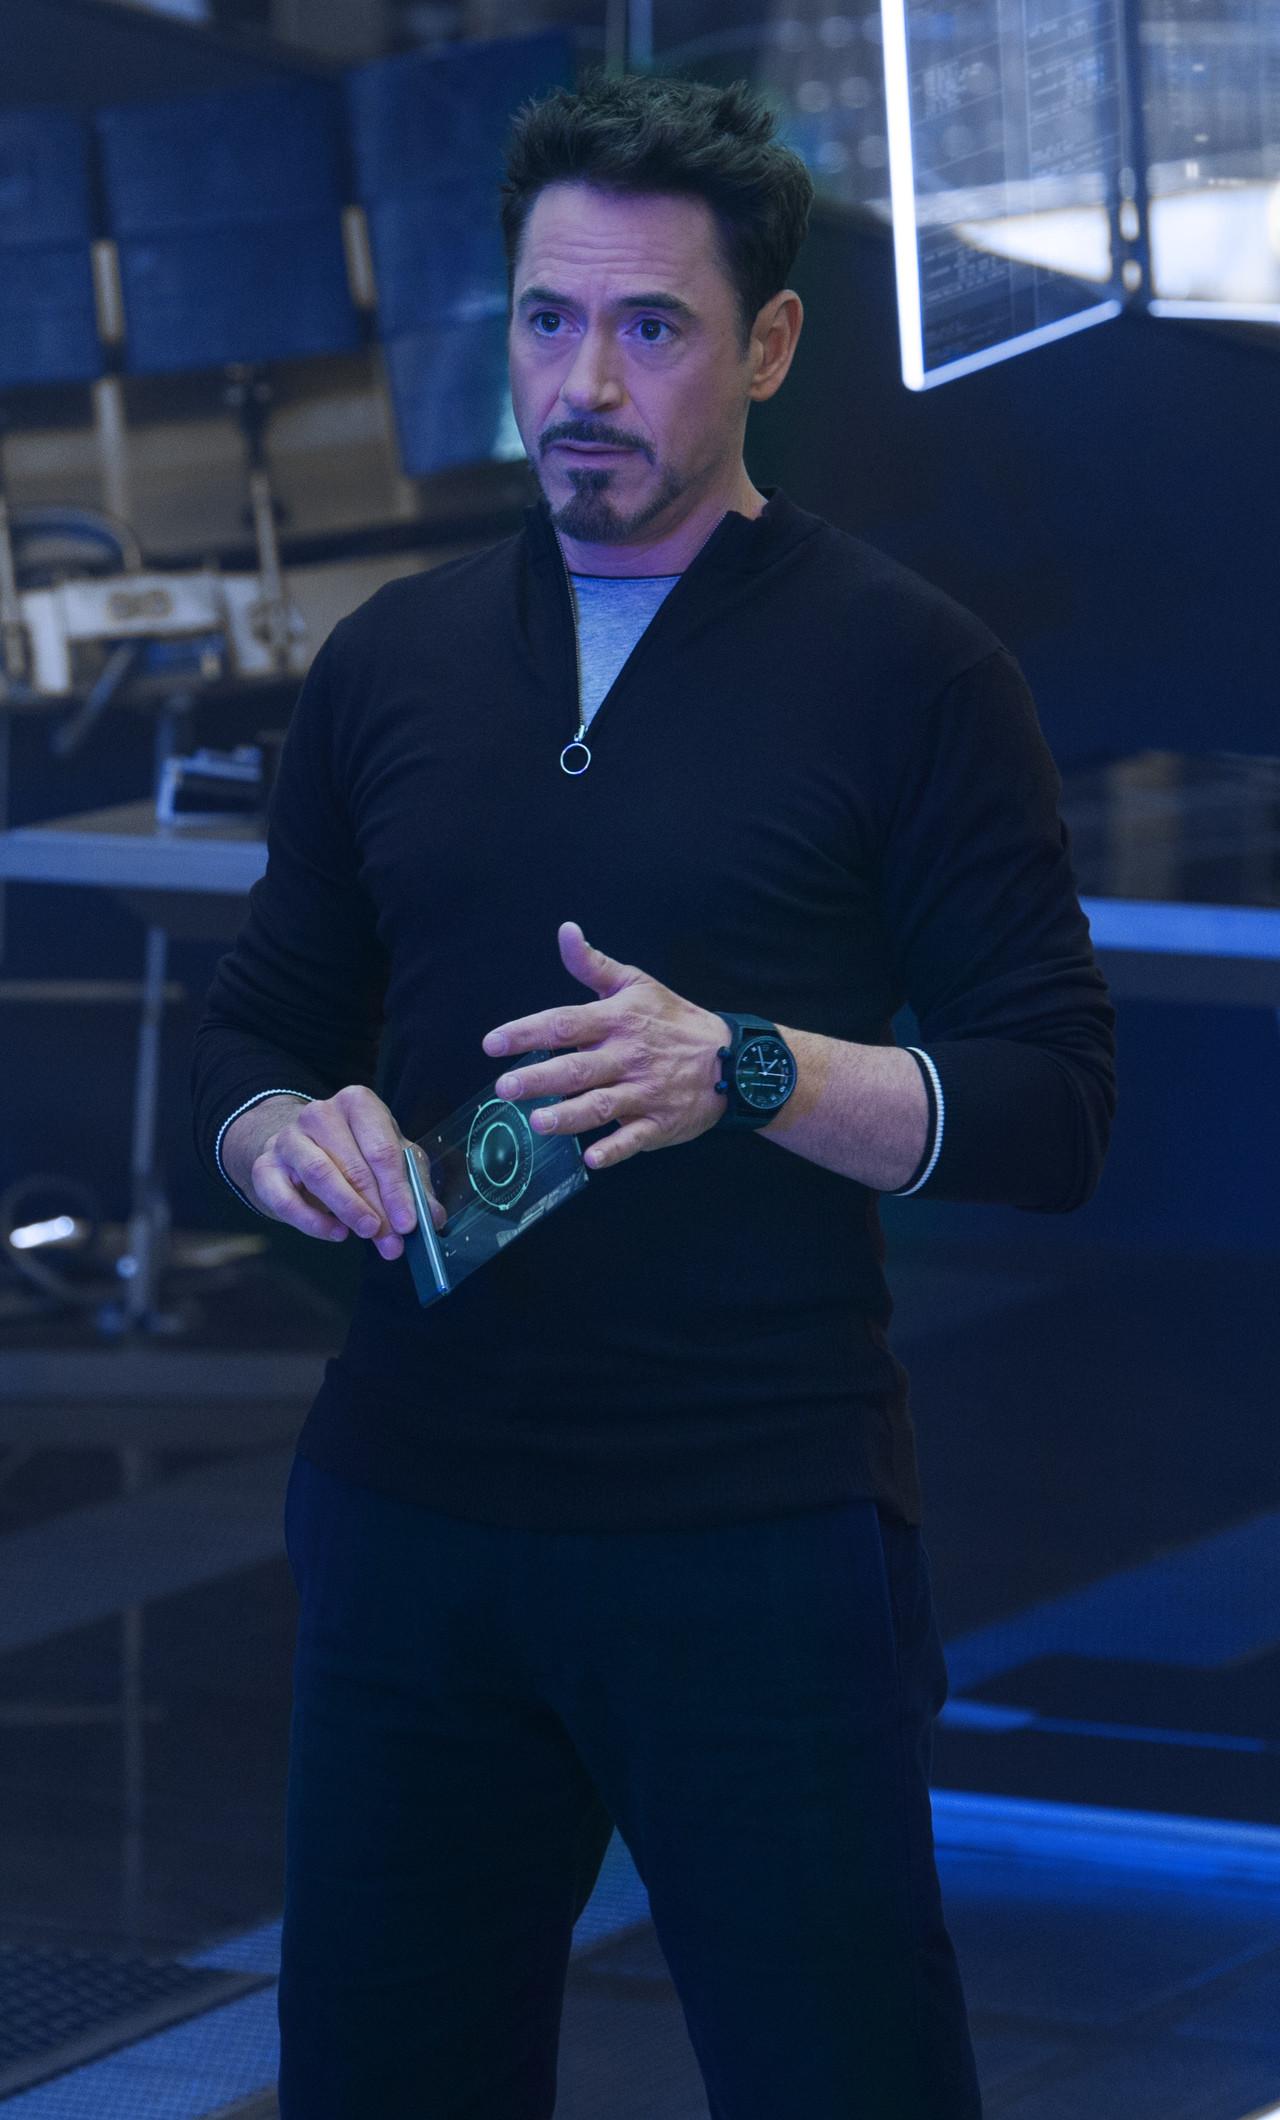 Tony Stark Wallpaper 67 Images